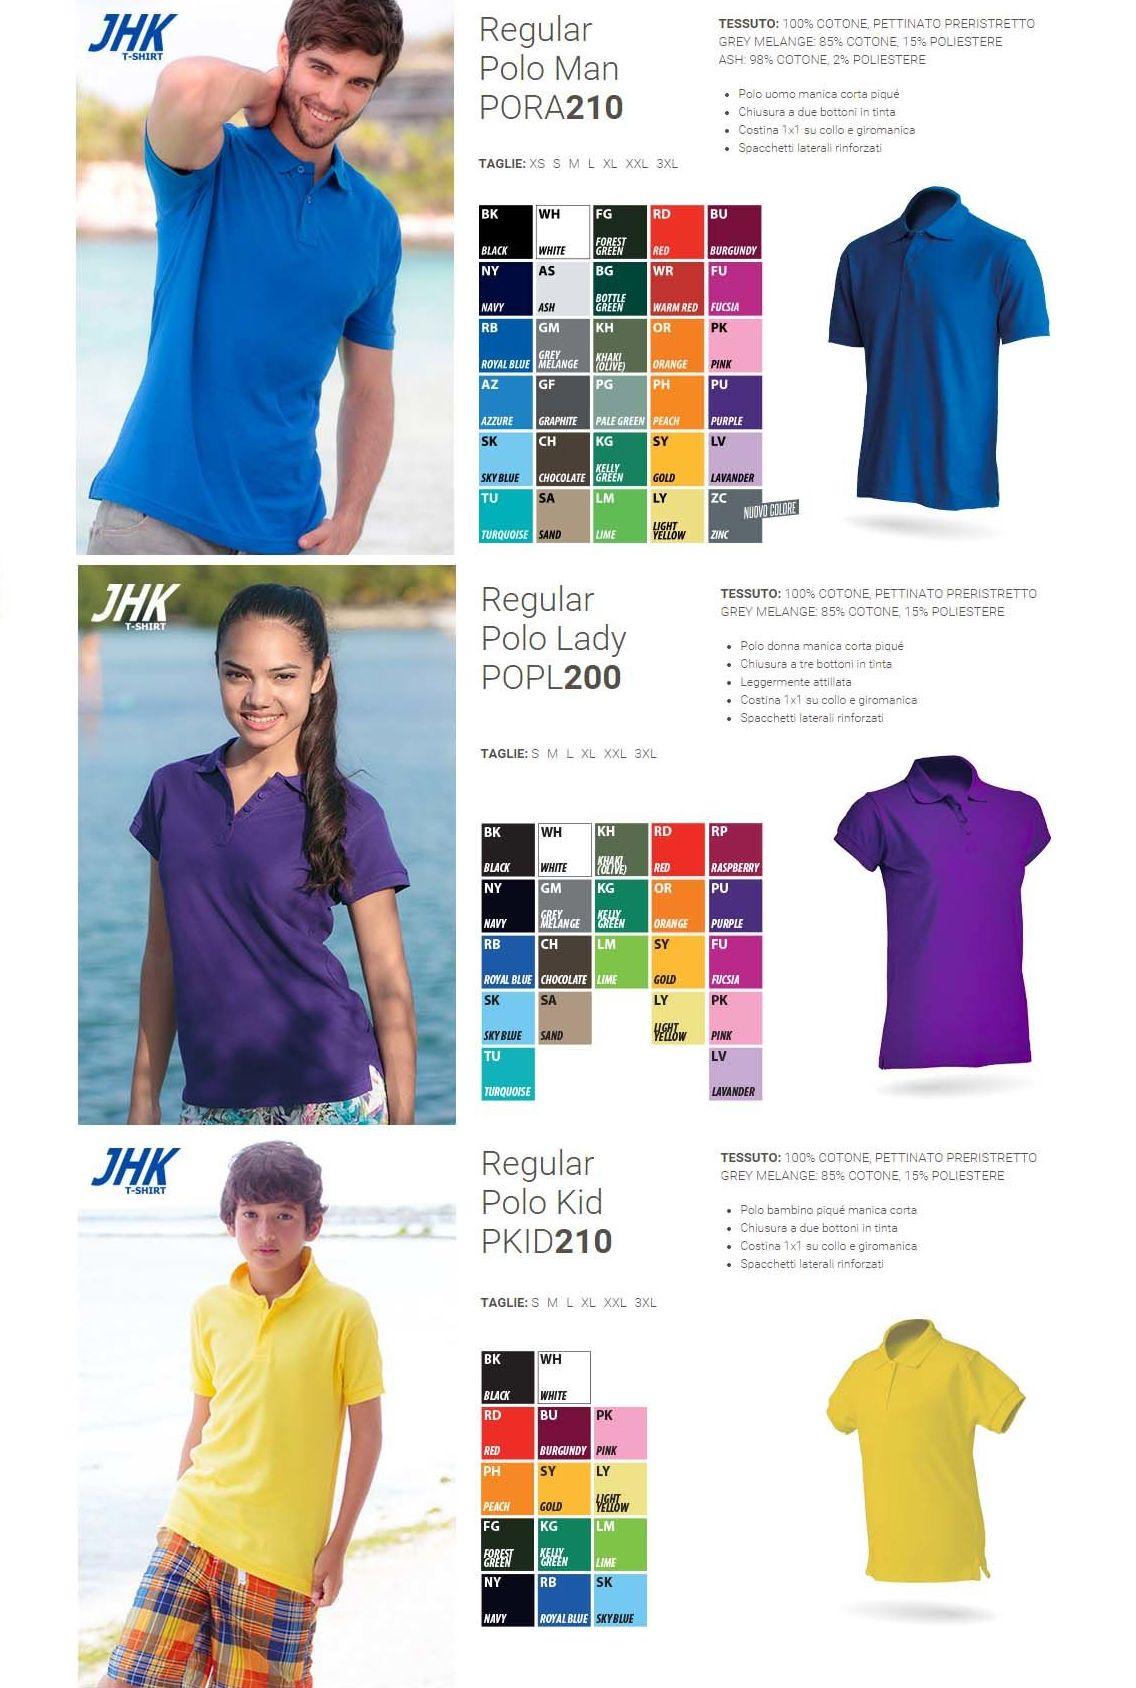 Polos JHK en diferentes colores